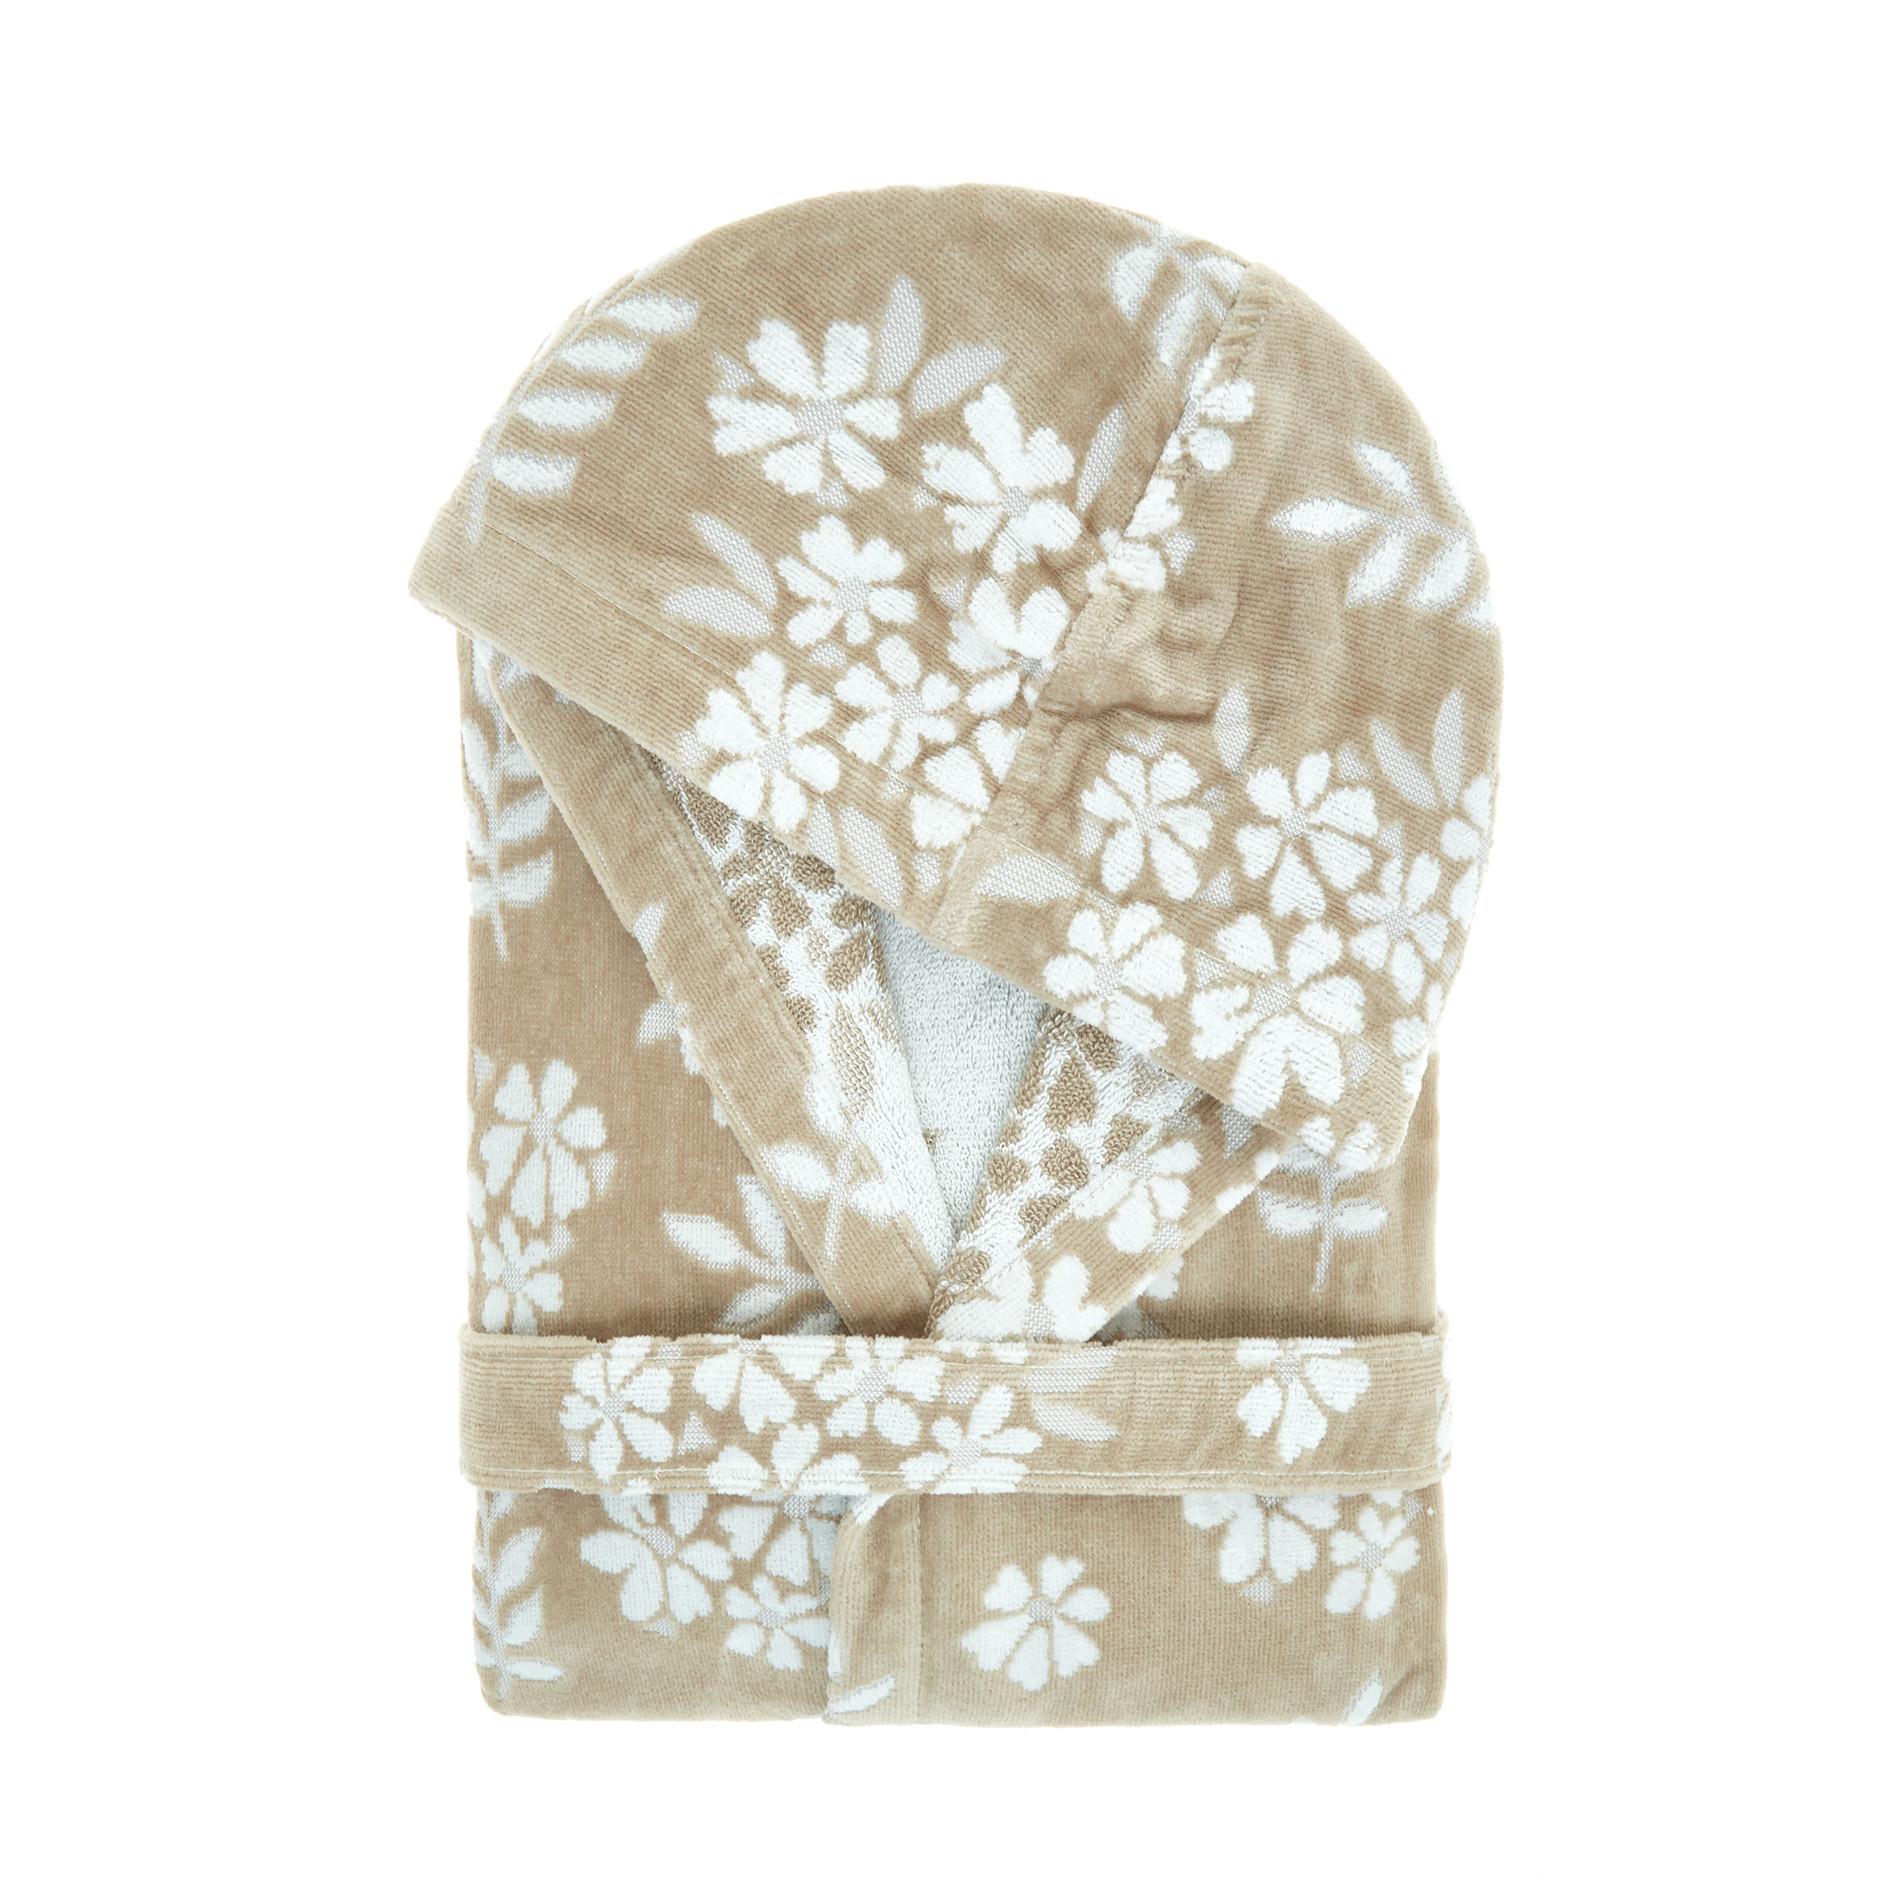 Accappatoio cotone velour motivo floreale Portofino, Beige, large image number 0